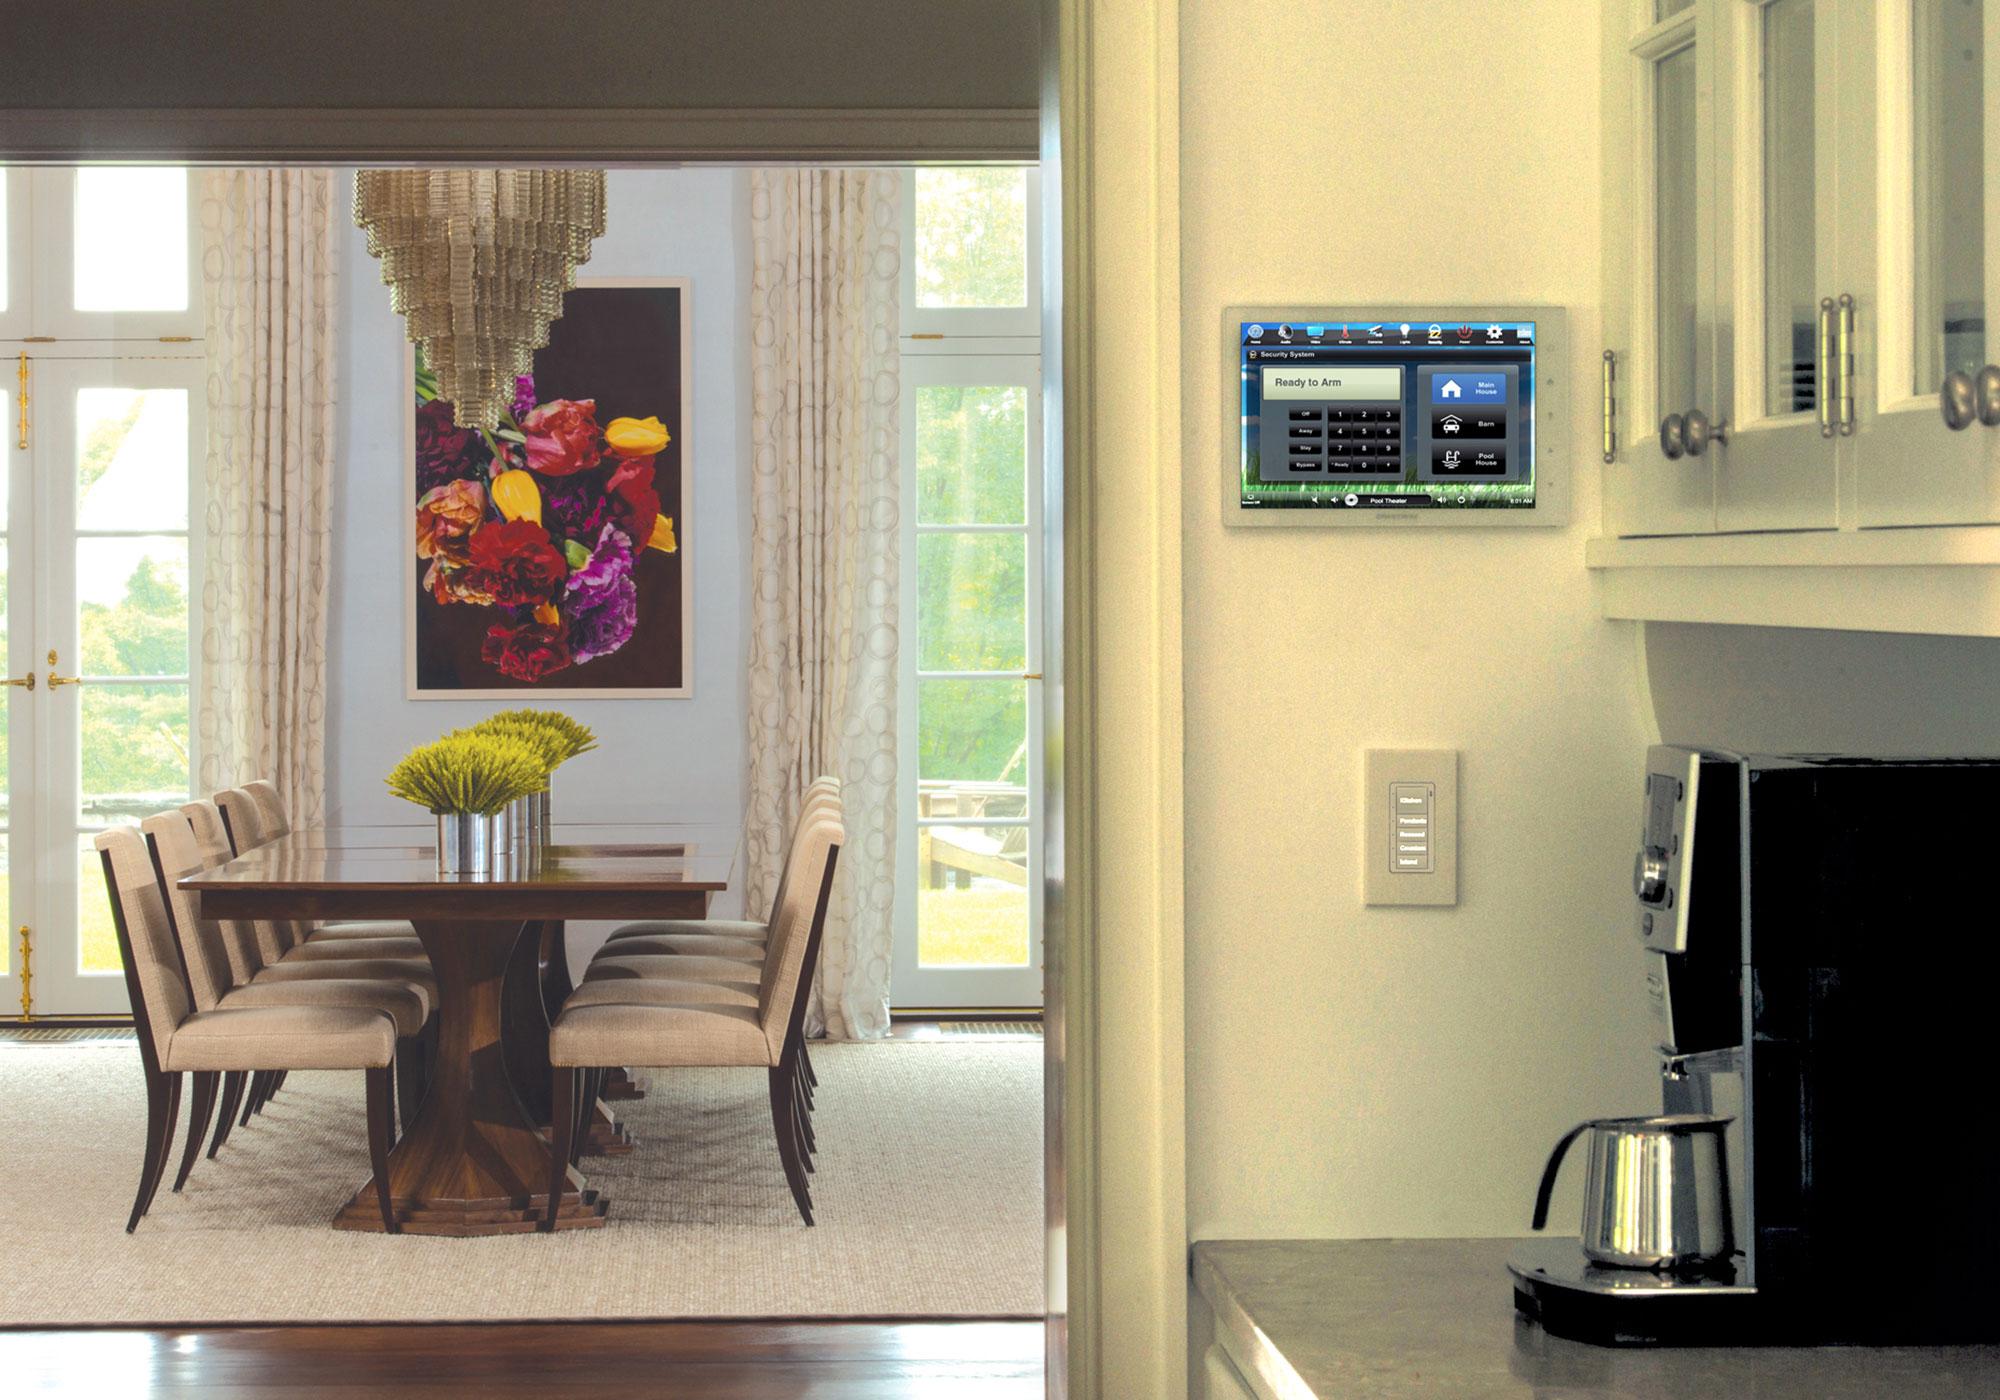 kitchen, dining room, touchscreen, wall-mount touchscreen, alarm screen, keypad